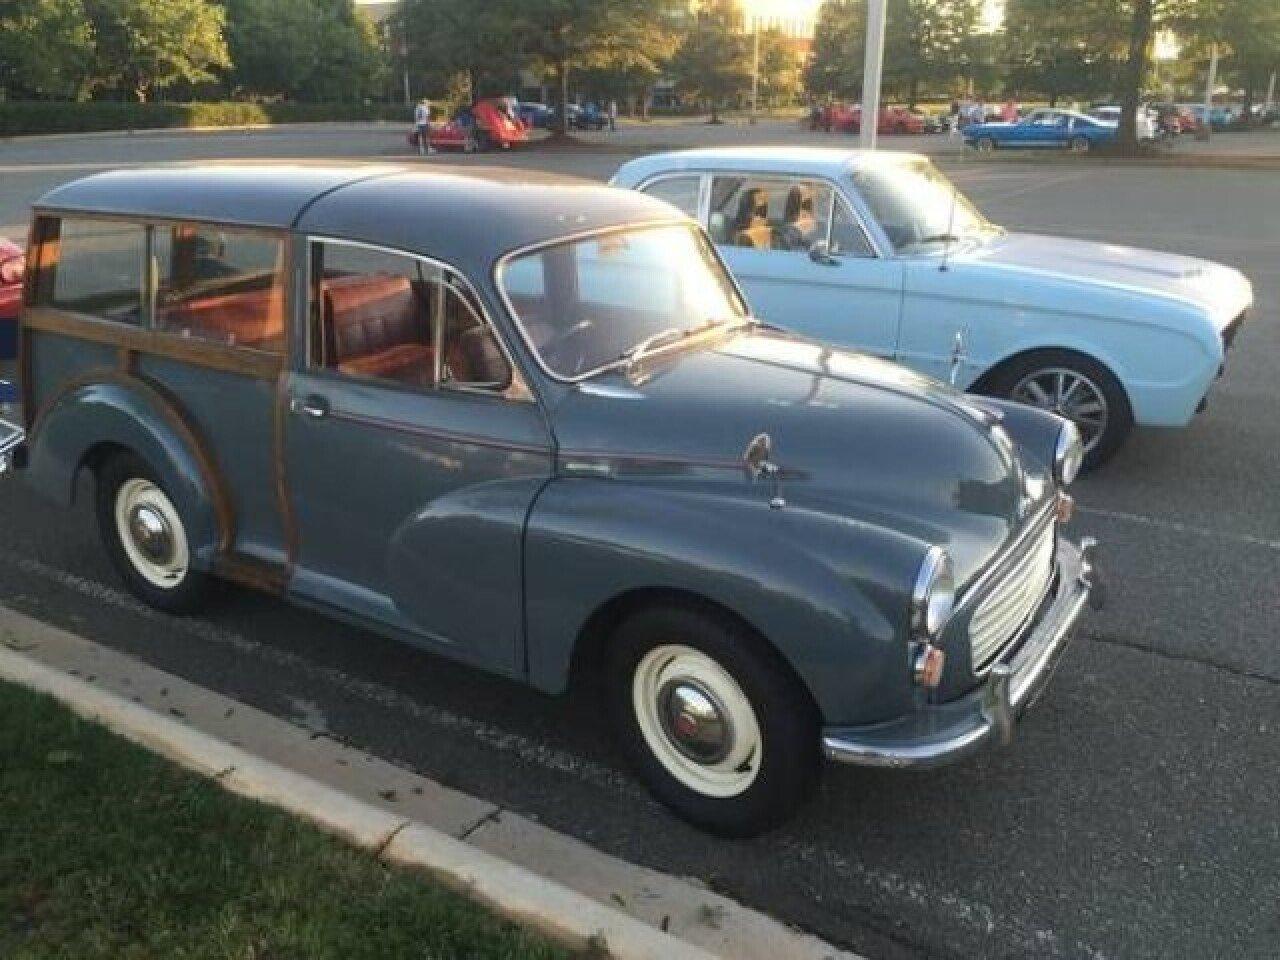 Classic Cars For Sale Auto Trader Com: 1960 Morris Minor For Sale Near Cadillac, Michigan 49601